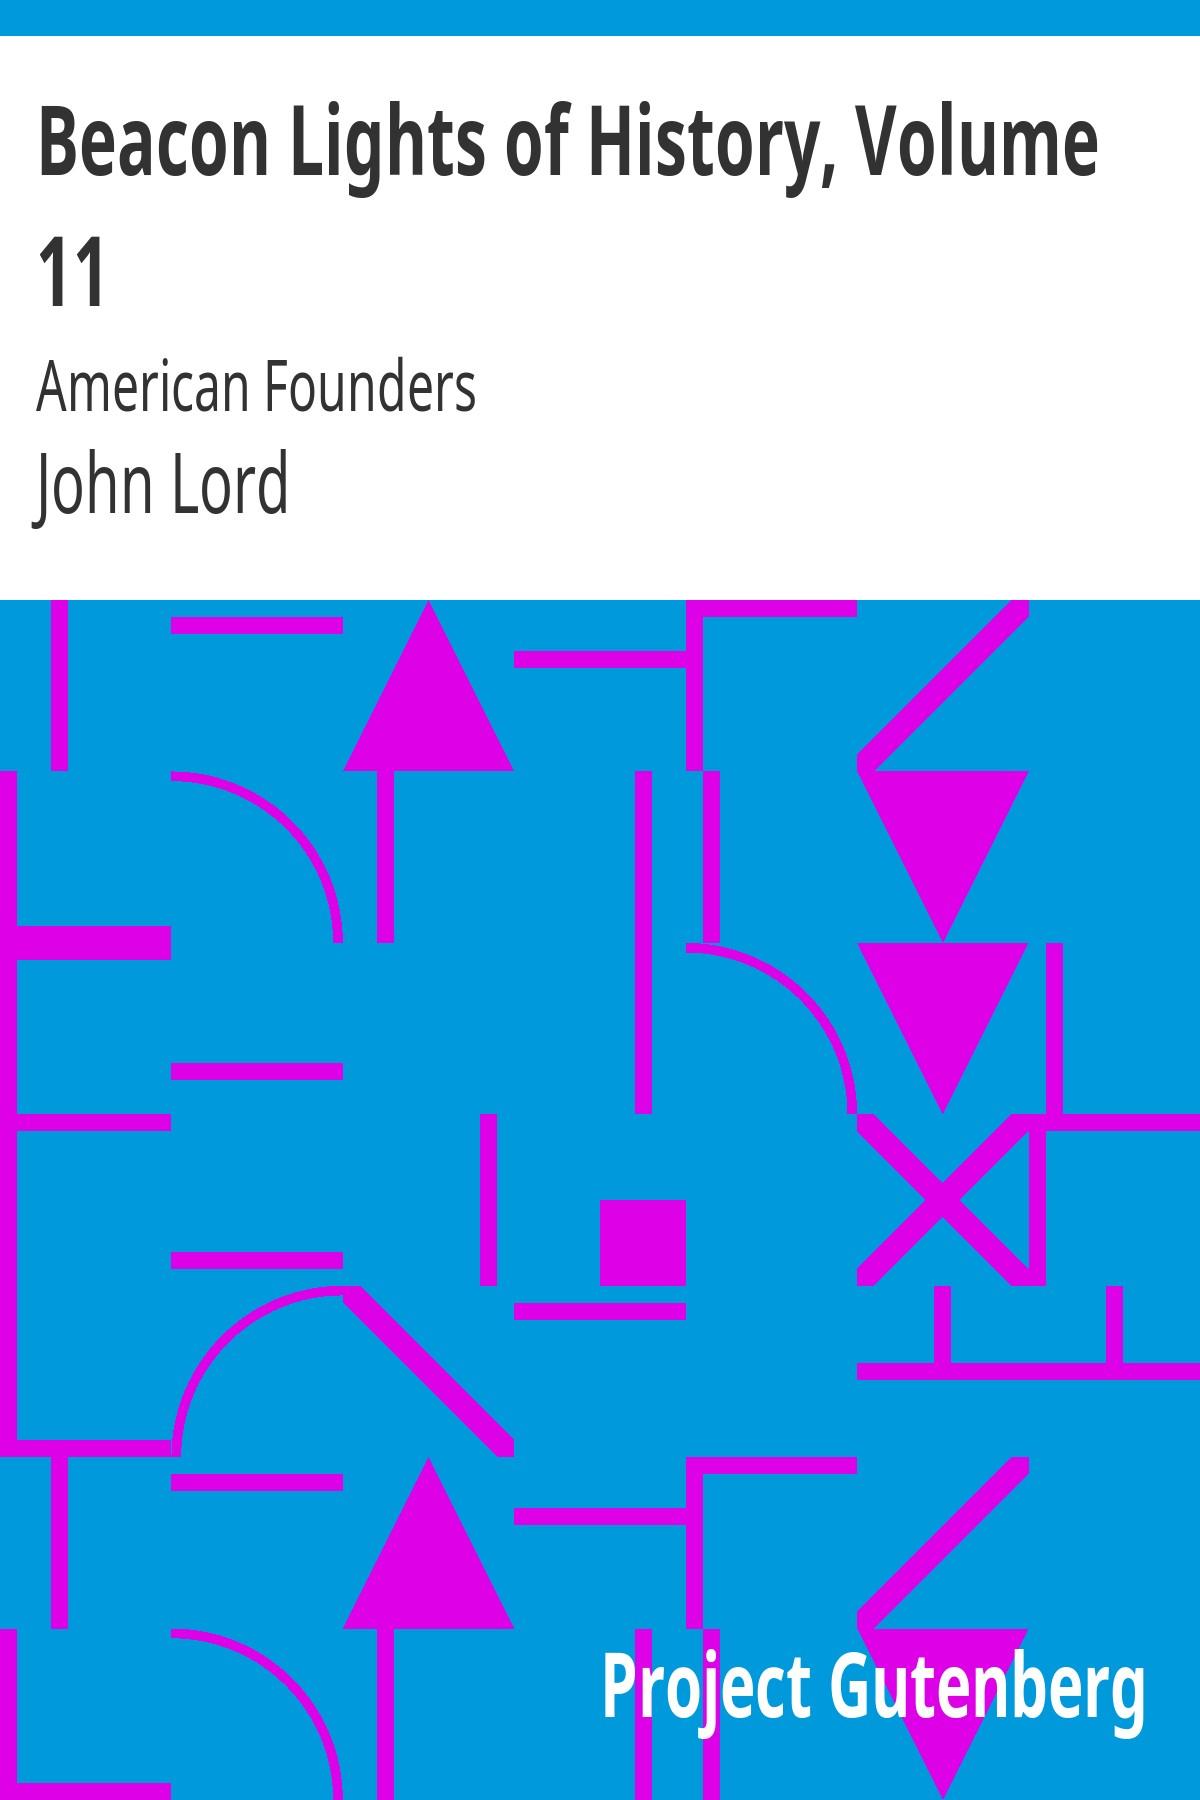 John Lord Beacon Lights of History, Volume 11: American Founders